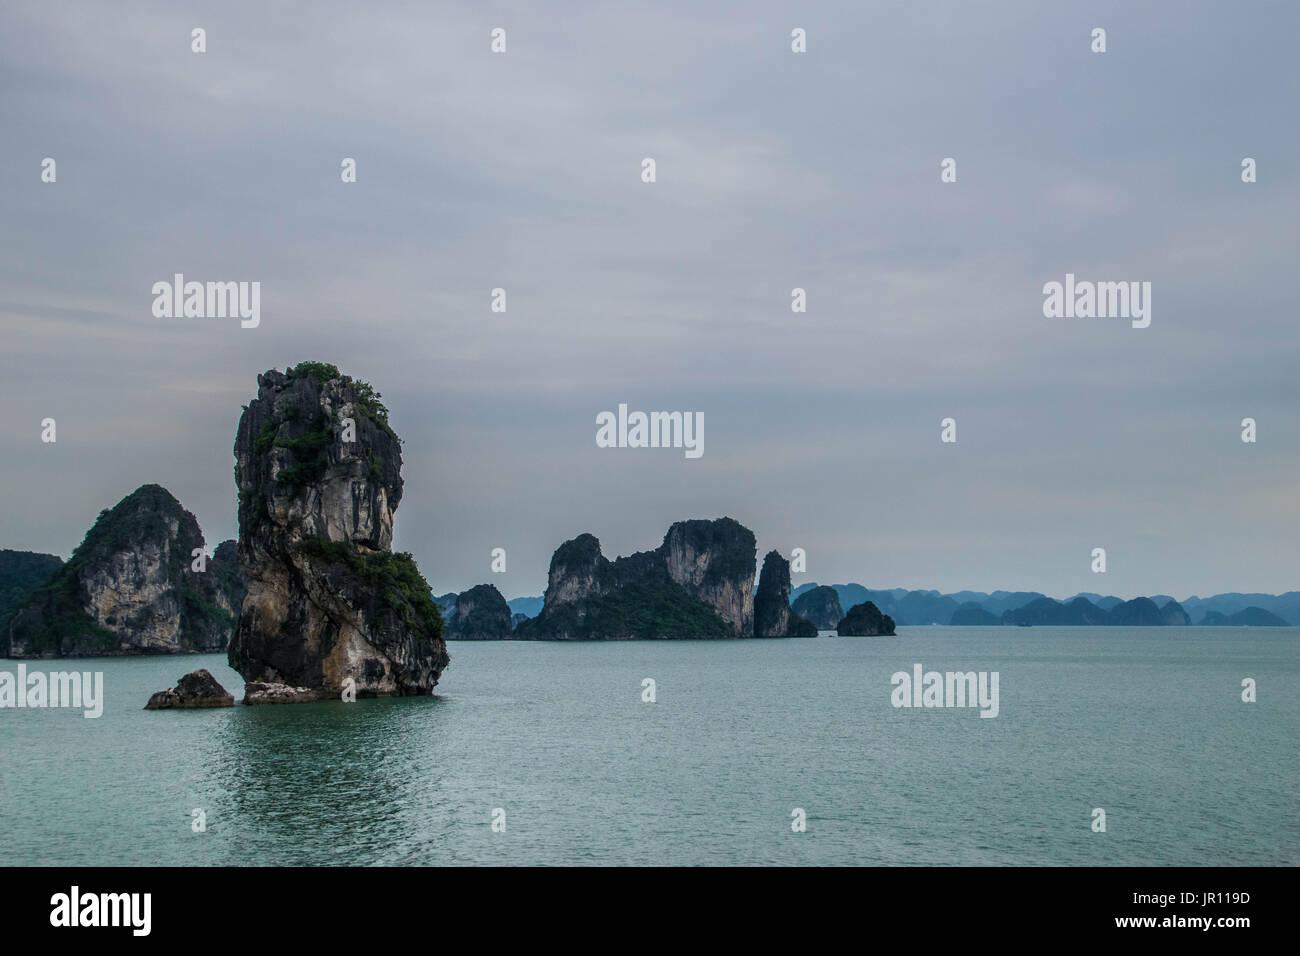 A limestone rock stack, in Ha Long Bay, Vietnam - Stock Image